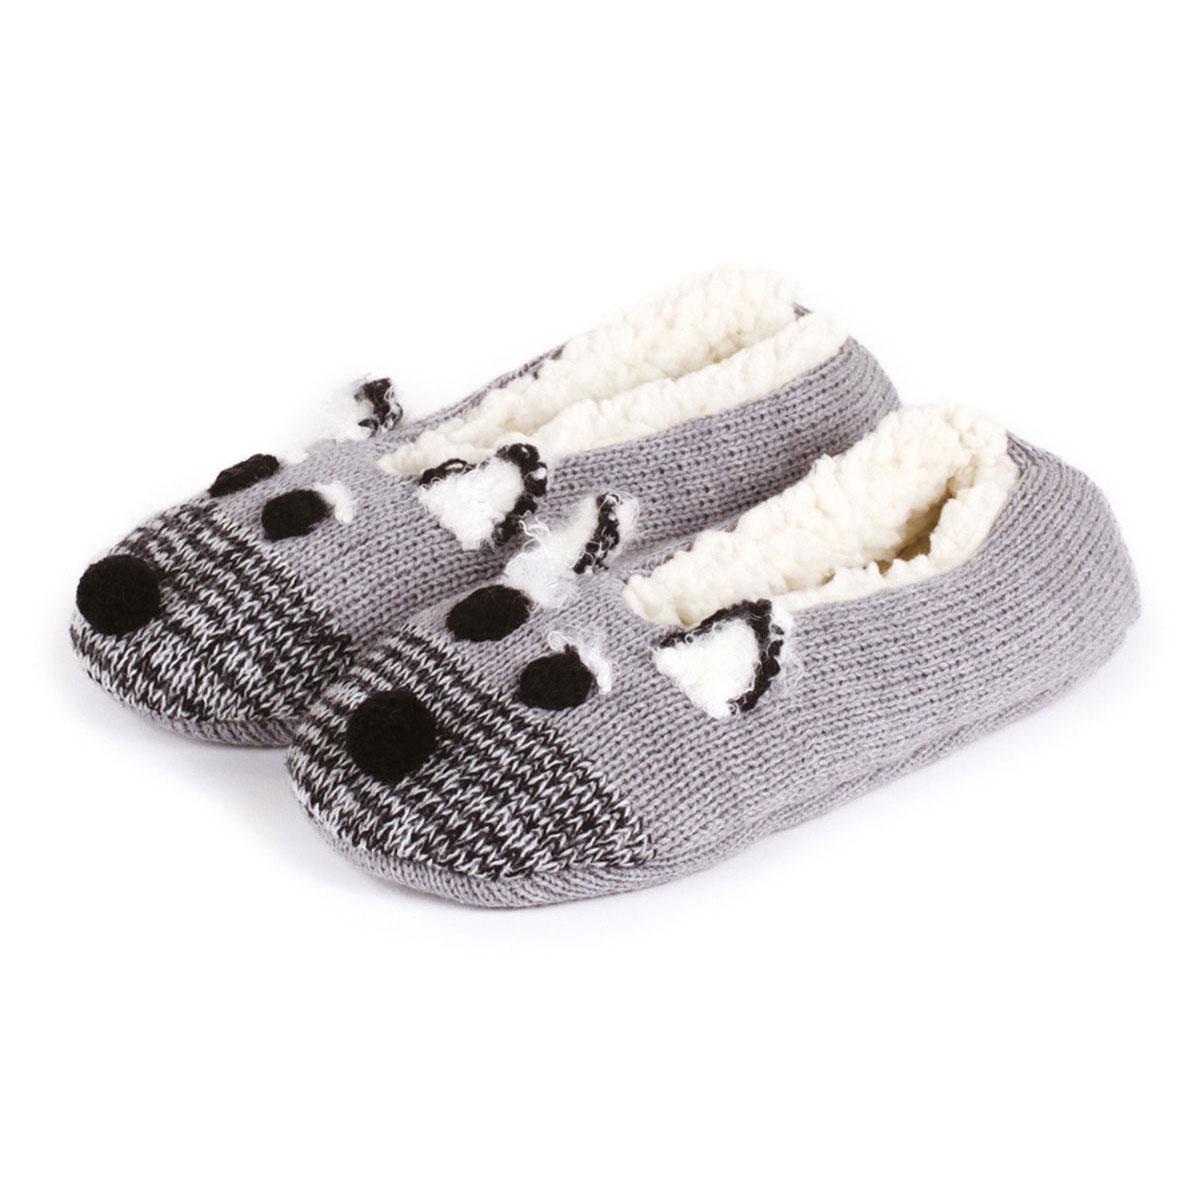 Totes Ladies Novelty Footsie Slipper Socks